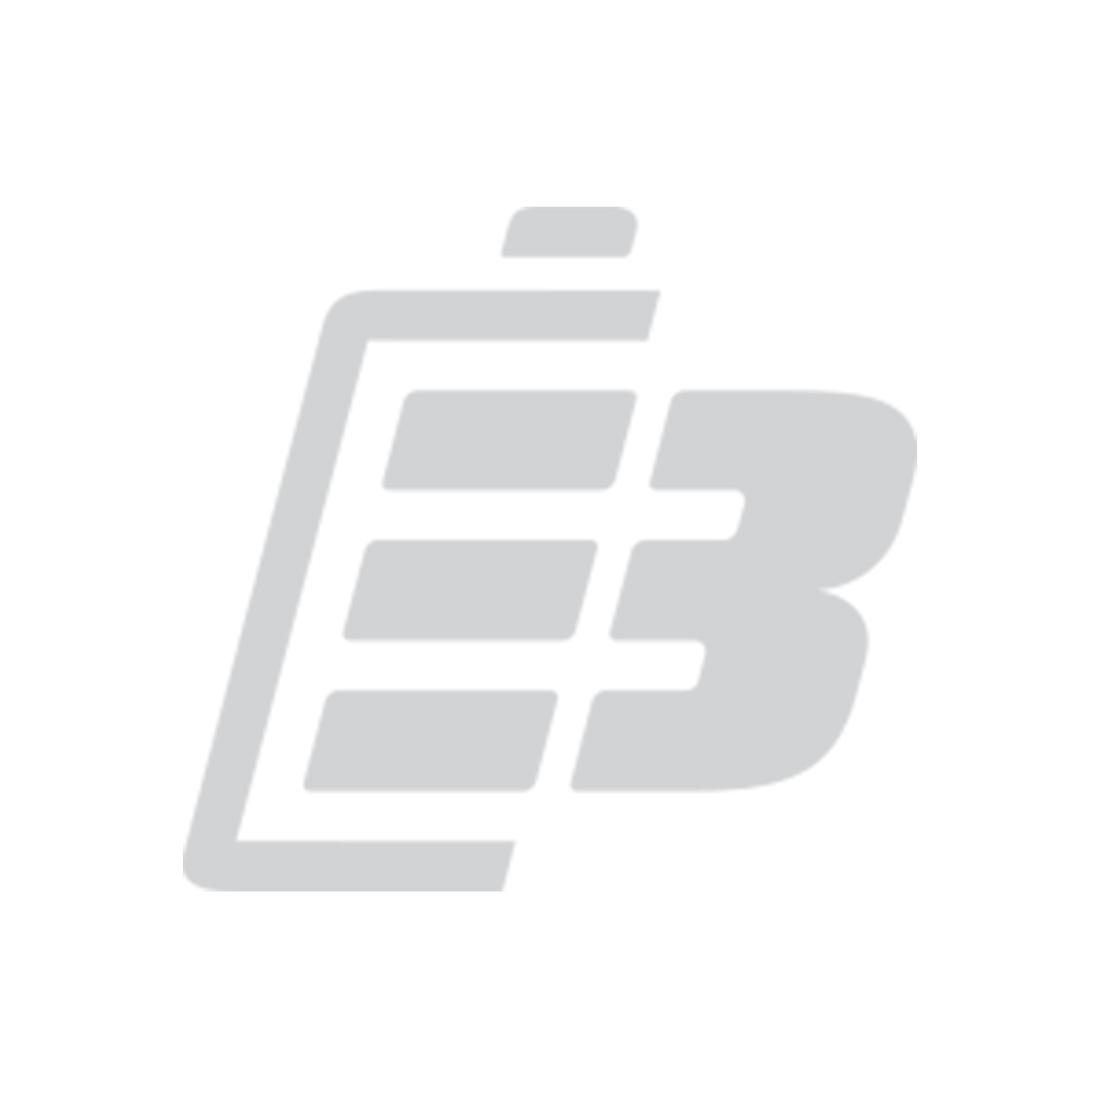 Efan NC2 2-bay USB Charger